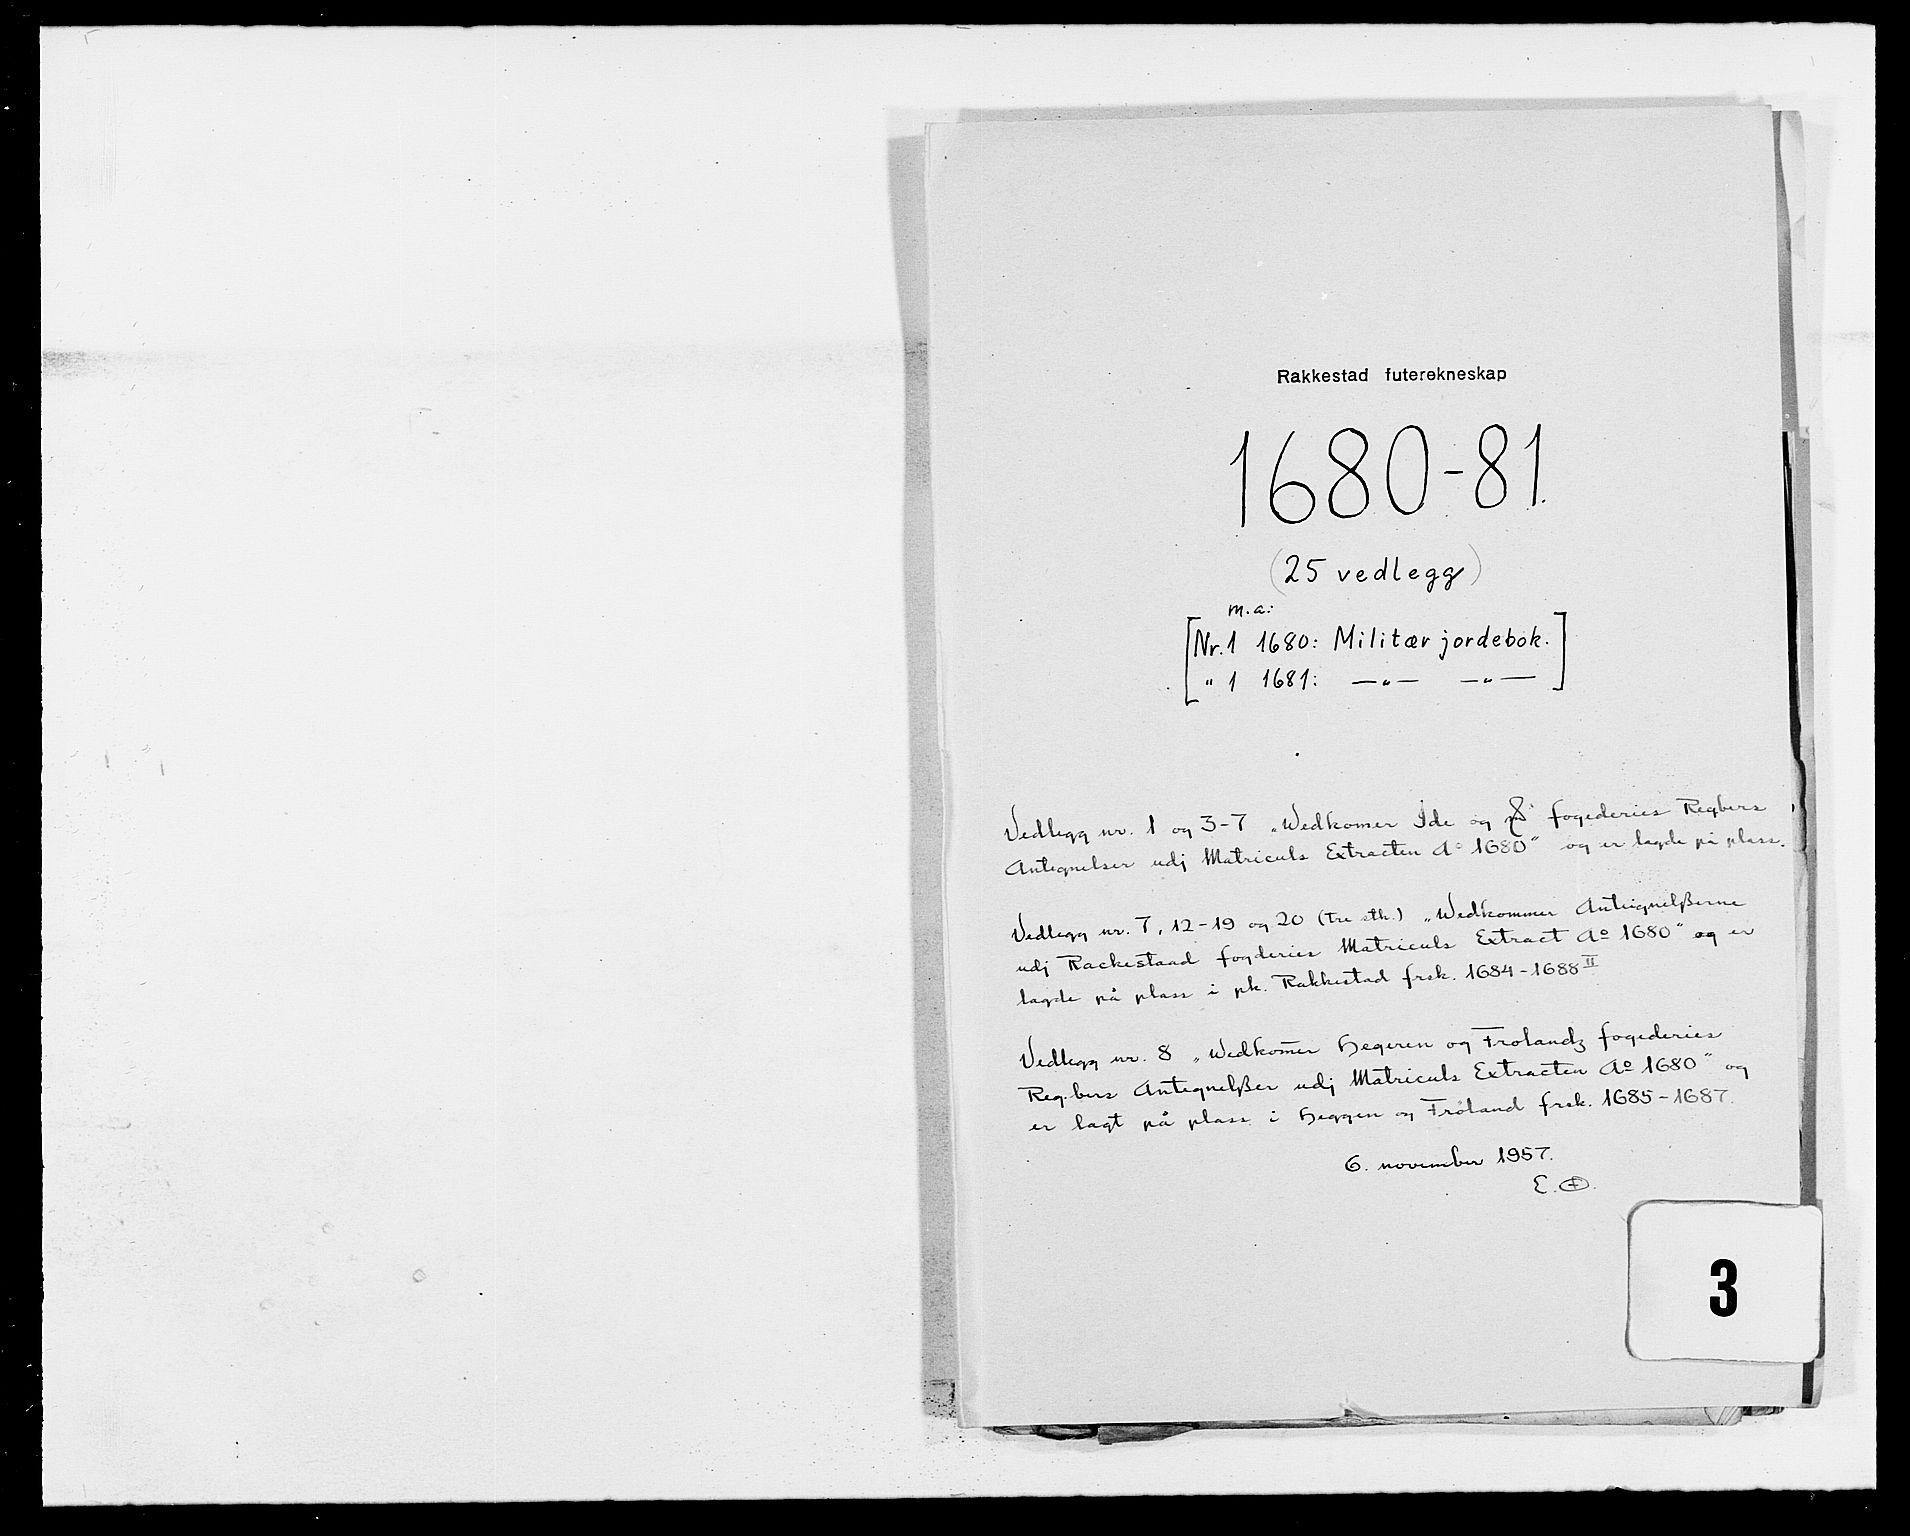 RA, Rentekammeret inntil 1814, Reviderte regnskaper, Fogderegnskap, R05/L0272: Fogderegnskap Rakkestad, 1680-1681, s. 402